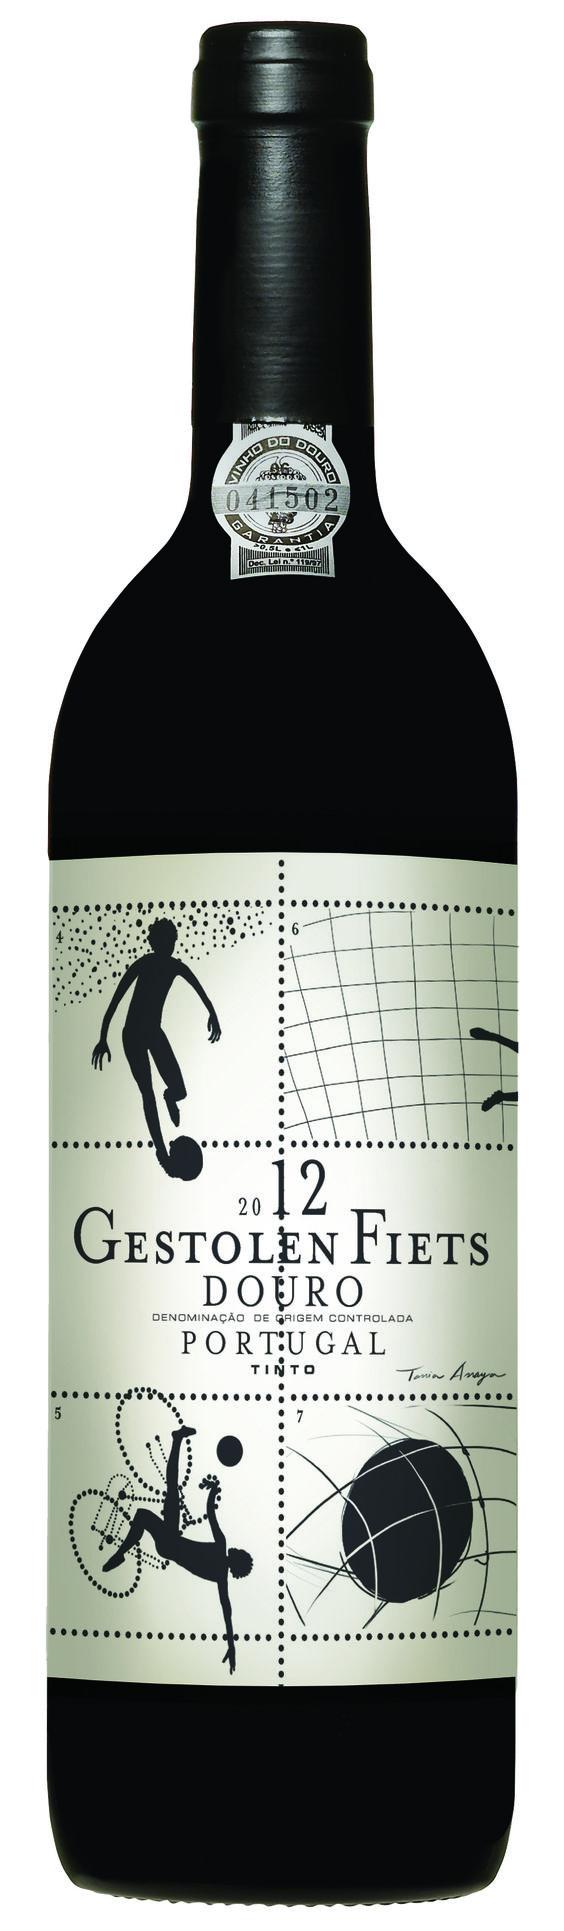 rótulo de vinho Niepoort - Futebol